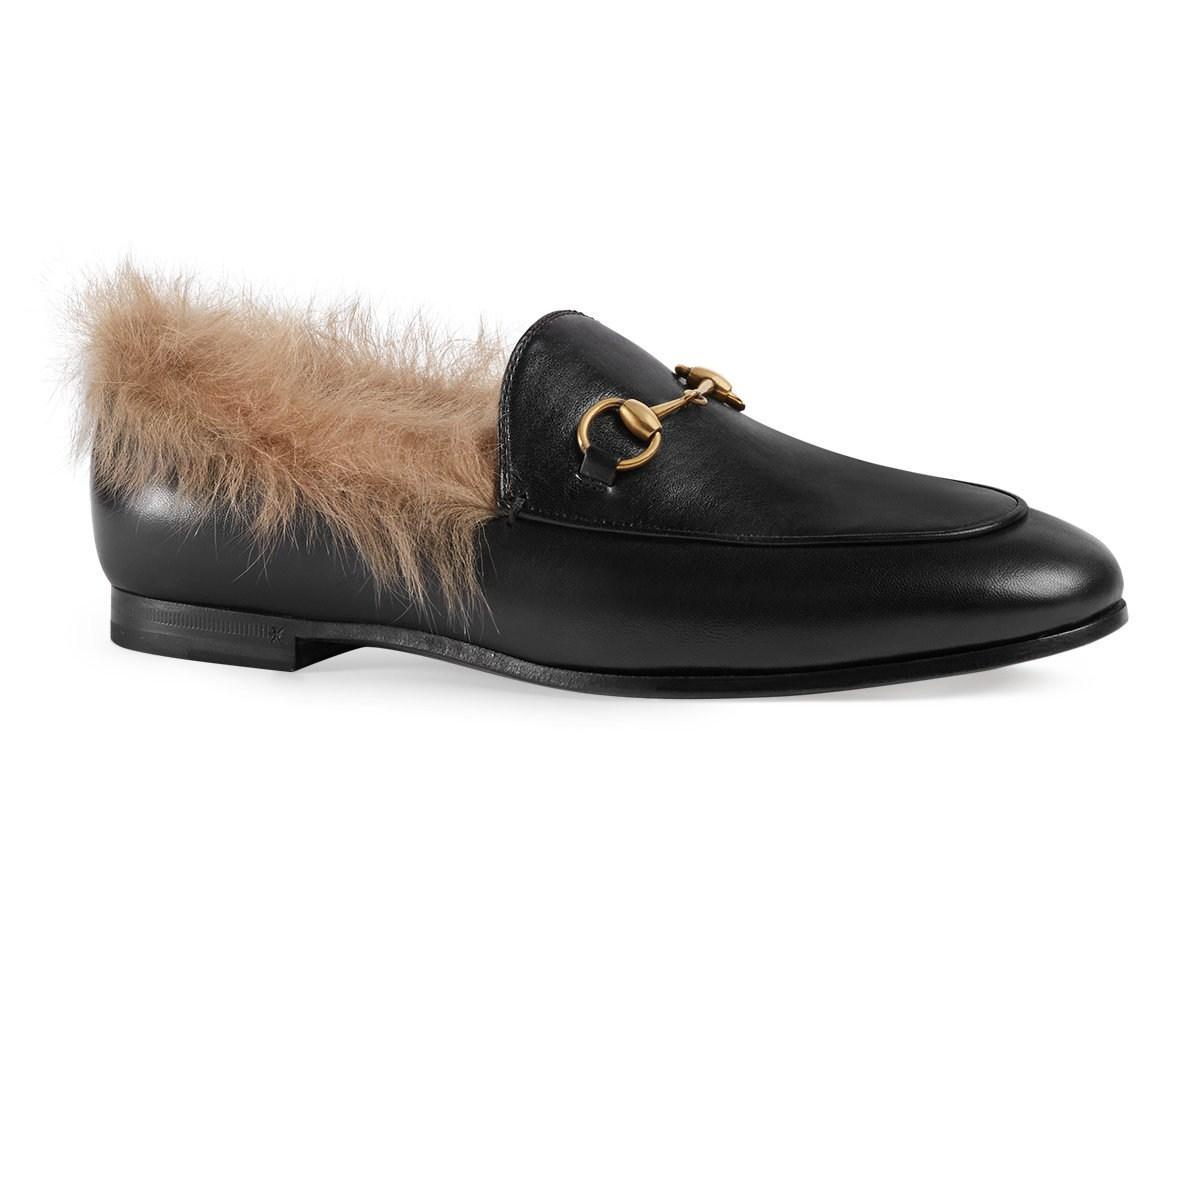 4d831bc3ecb Gucci - Black Jordaan Leather Loafers - Lyst. View fullscreen